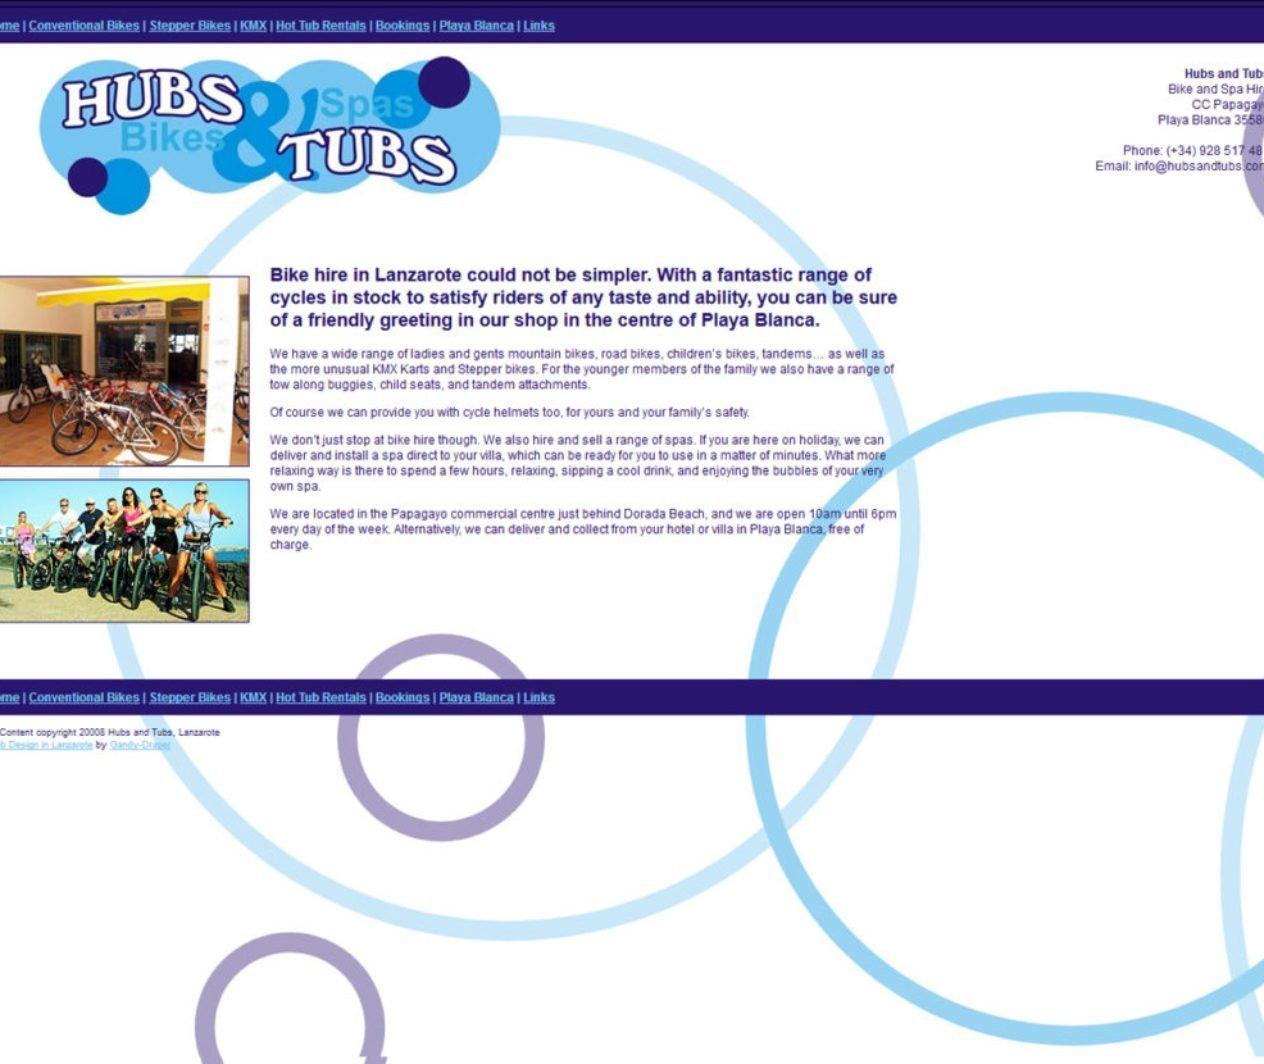 Hubs and Tubs